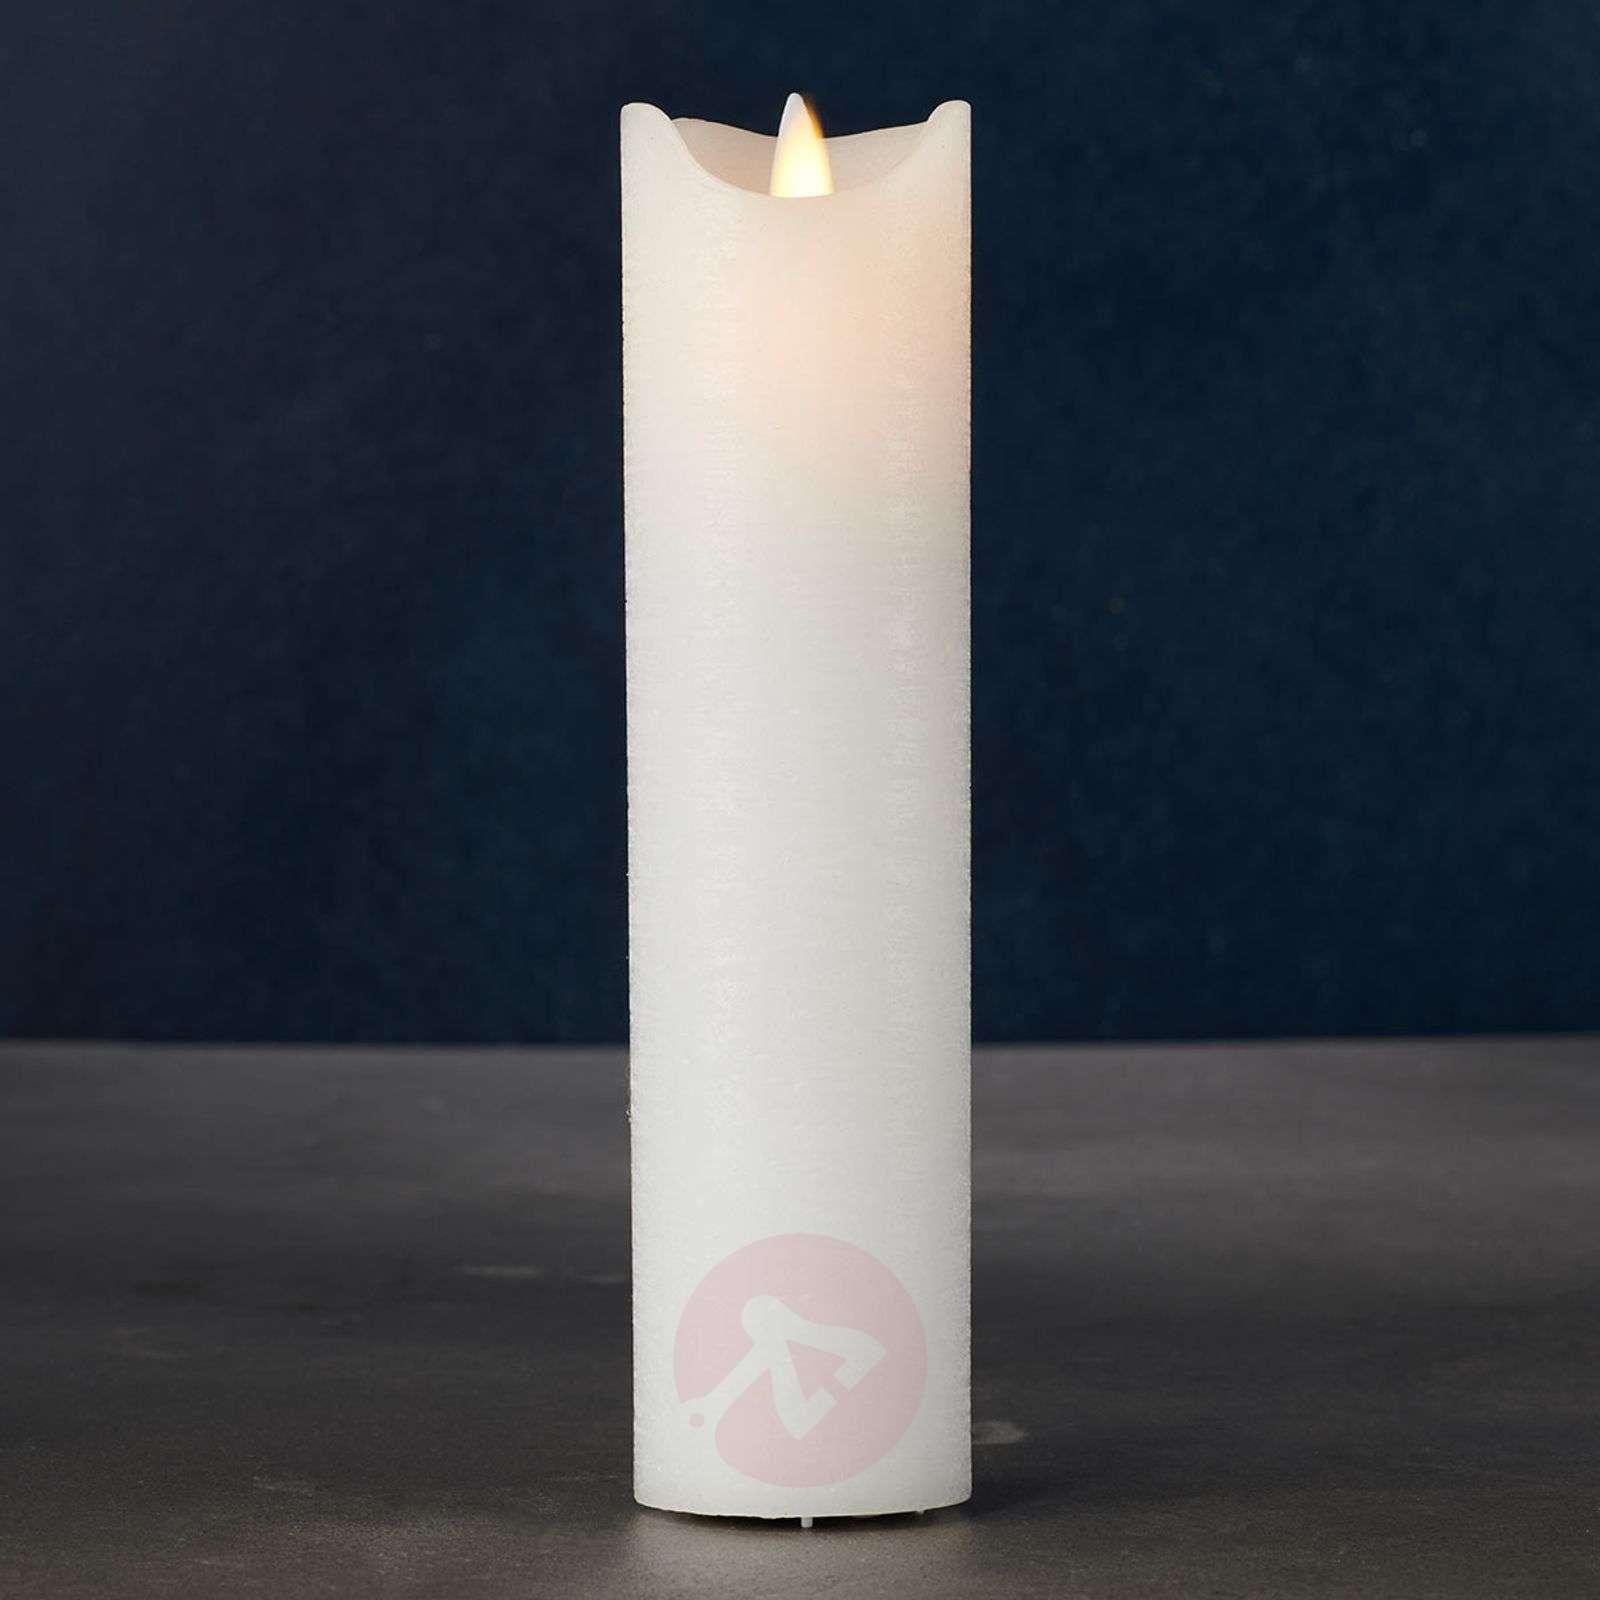 Lepattava LED-kynttilä Sara Exclusive Ø 5 cm-8577258X-01